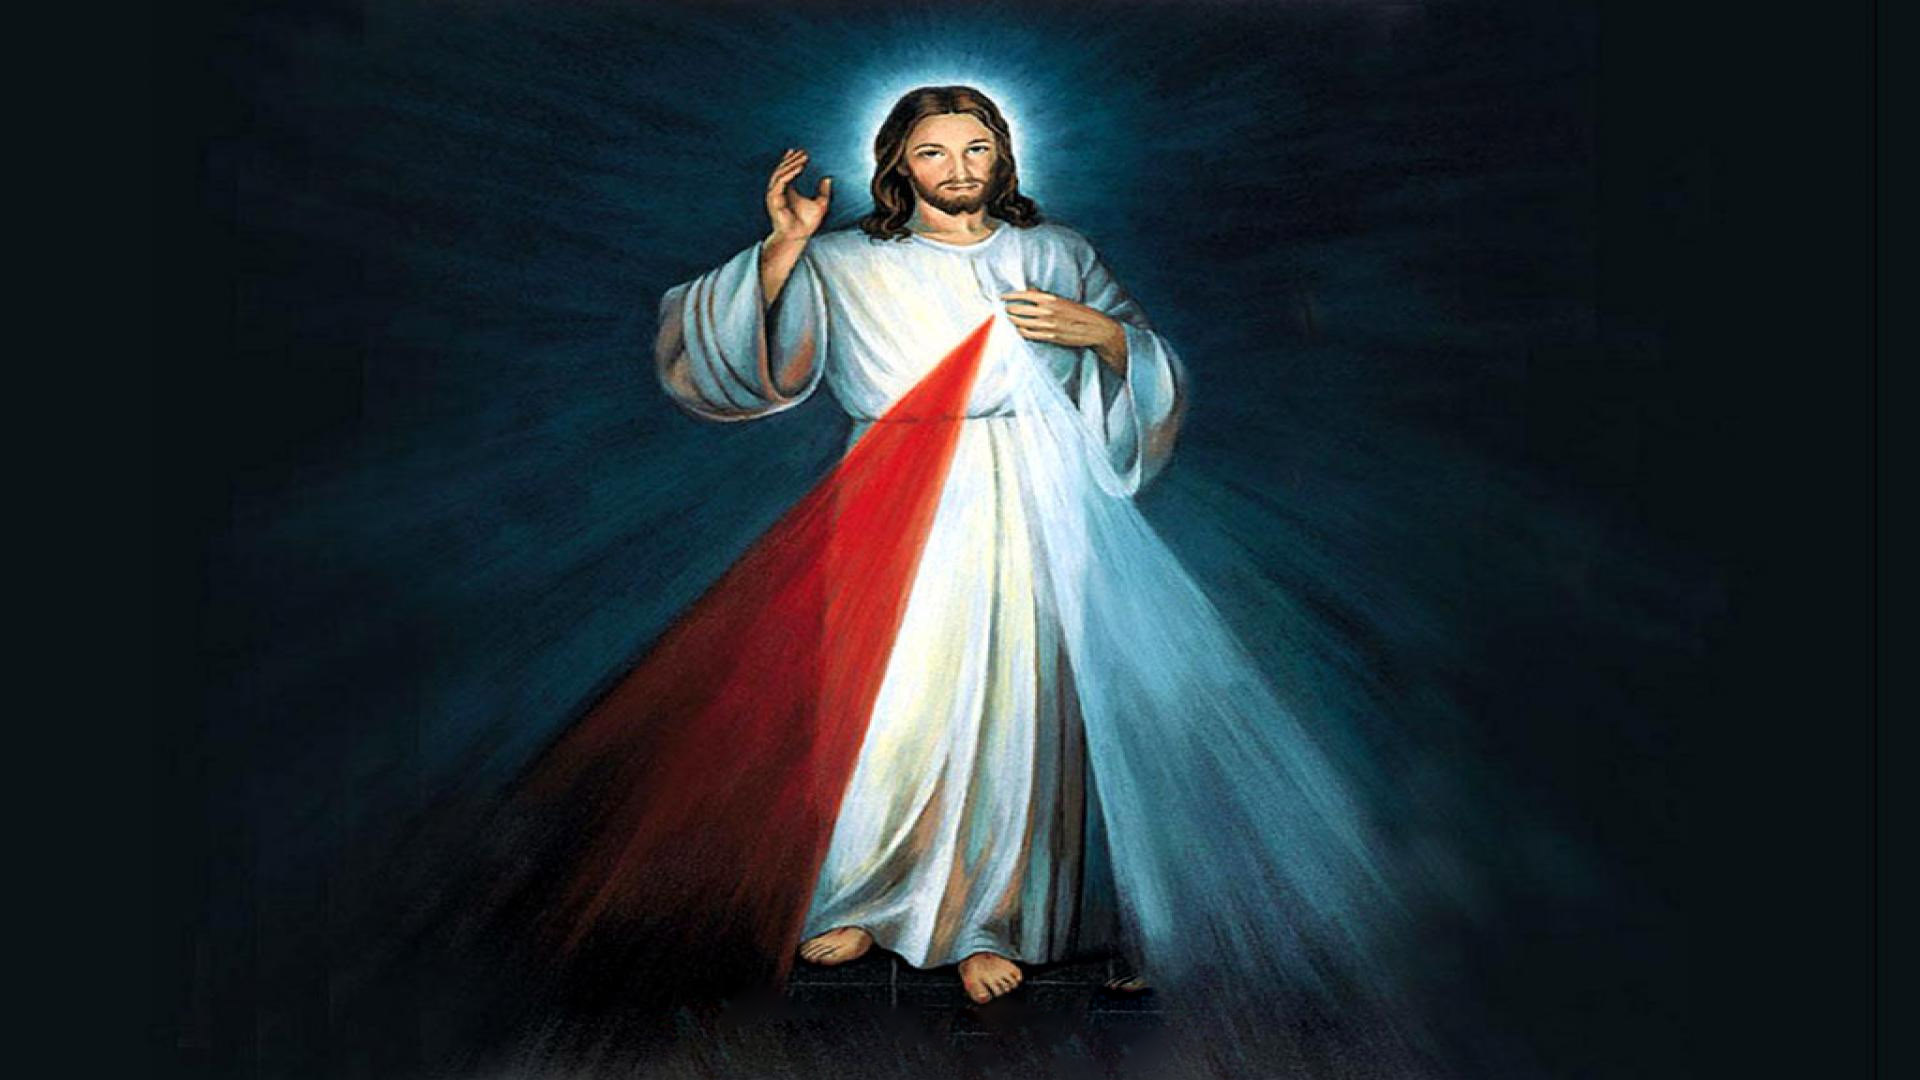 Jesus Christ Lights Christianity God Wallpaper Hd